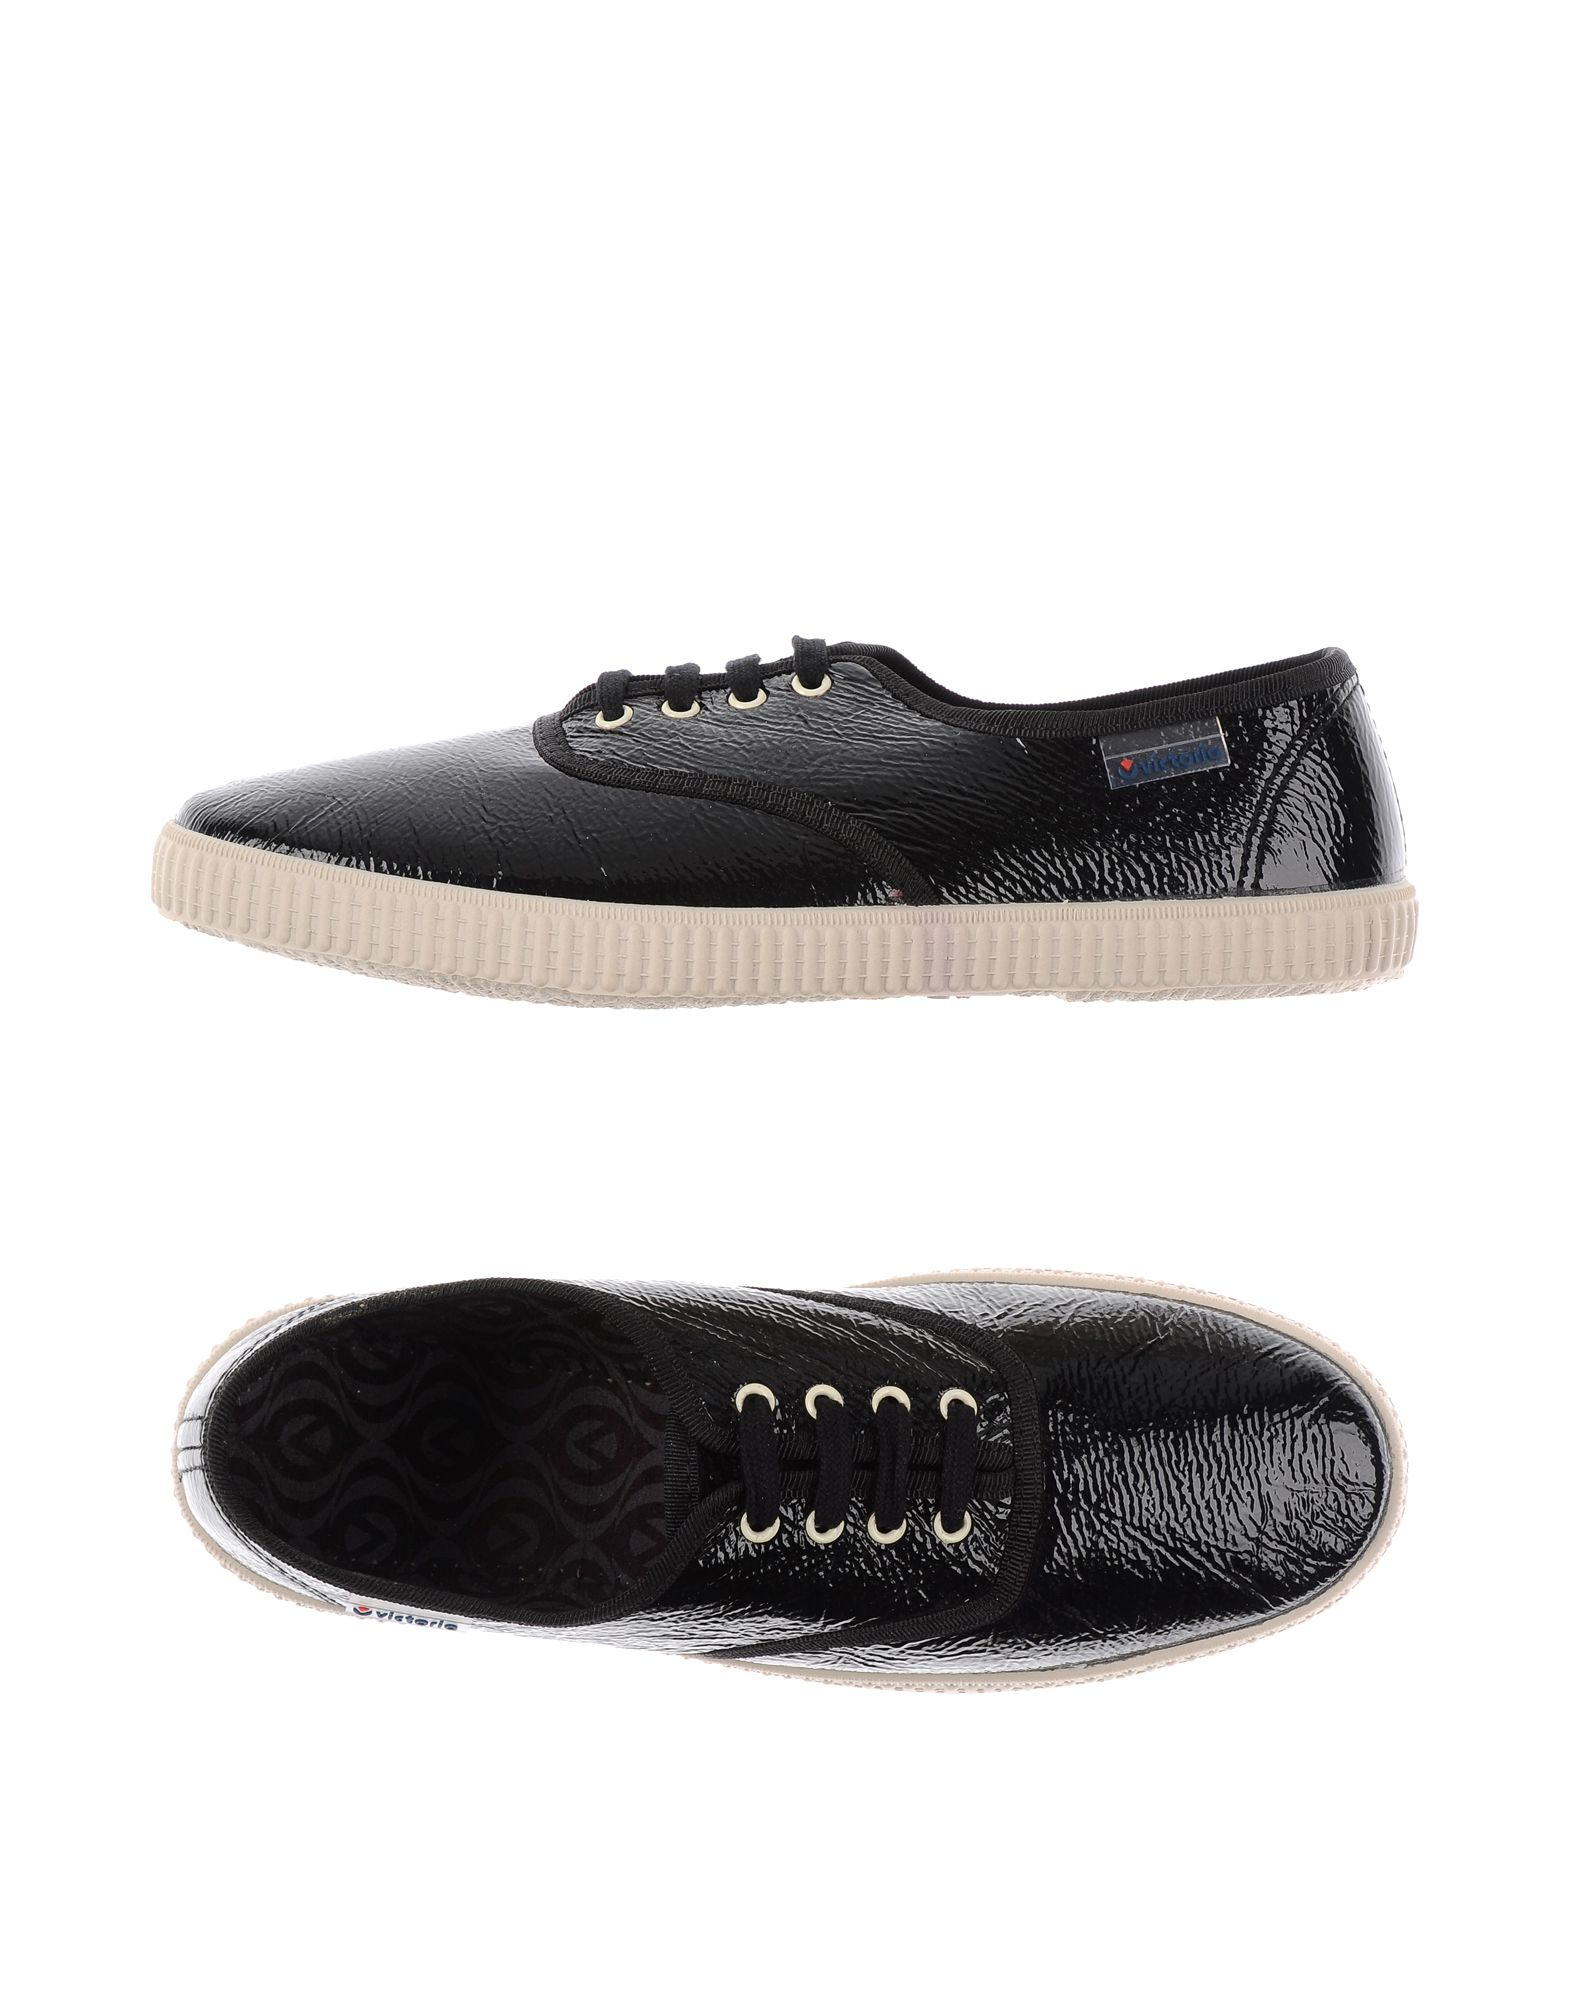 Victoria Sneakers Damen Damen Sneakers  44820908LJ  123363